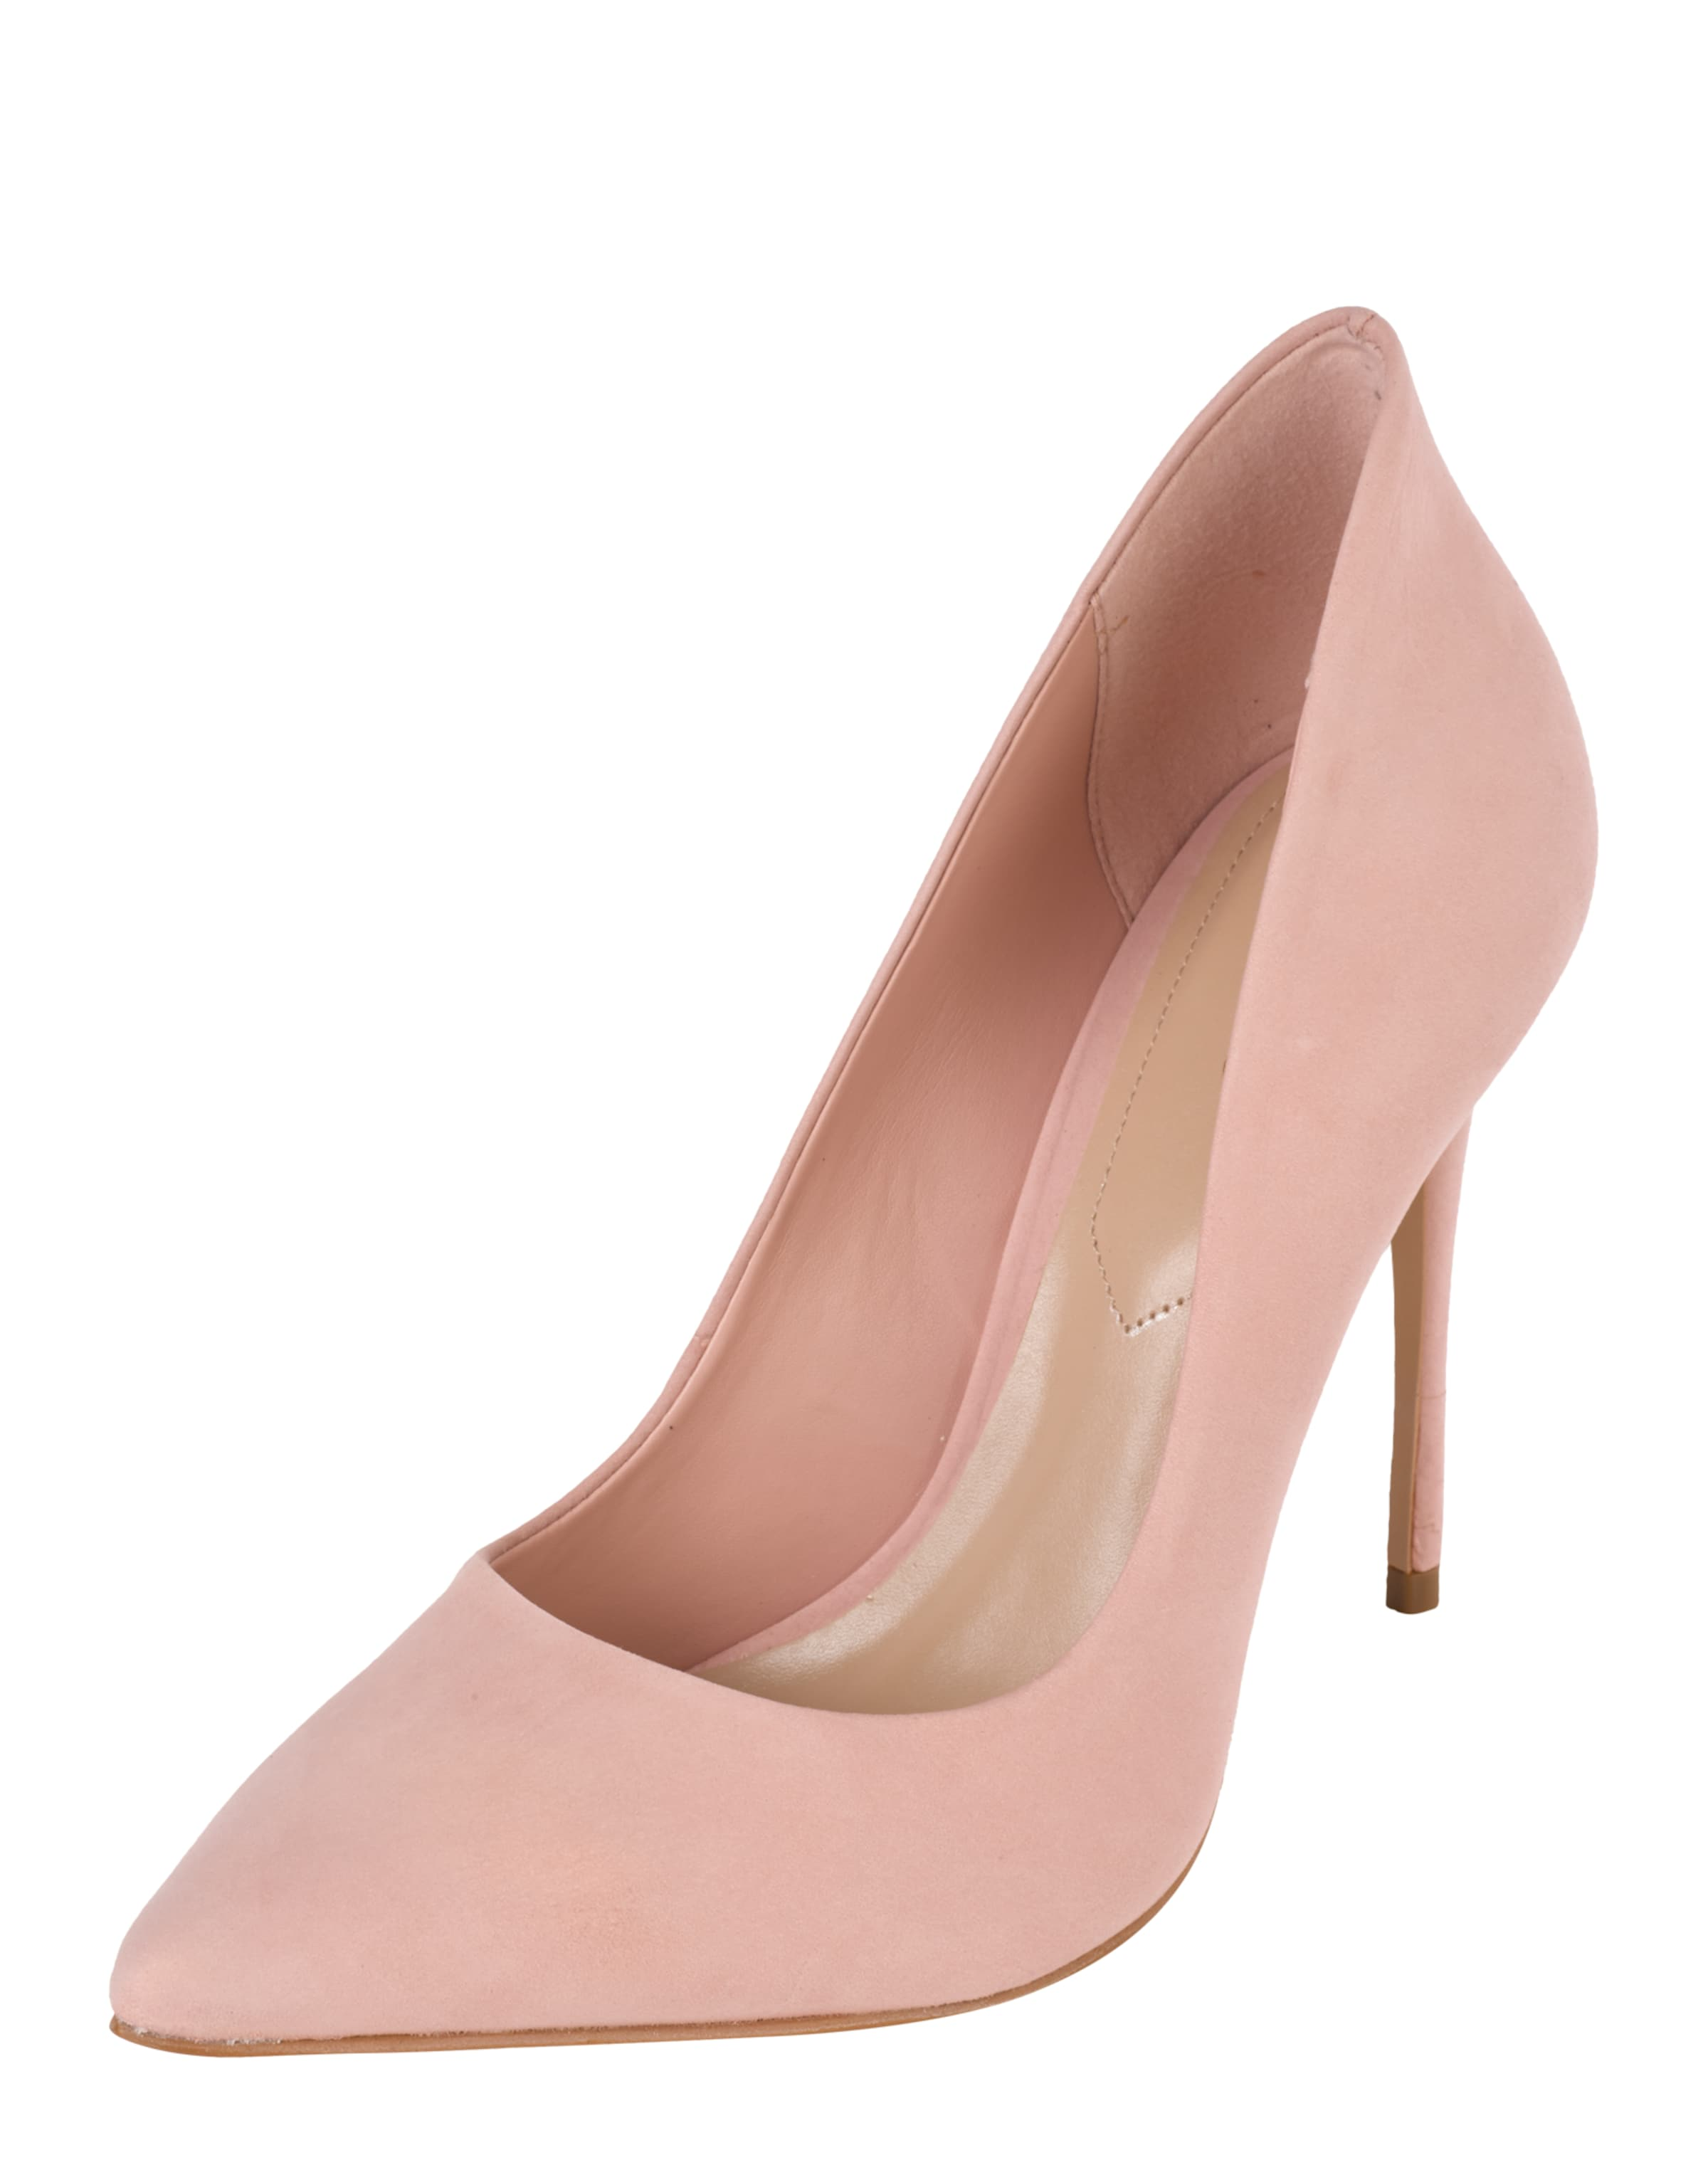 Haltbare Mode billige Schuhe ALDO | High Heels 'Cassedy' Schuhe Gut getragene Schuhe